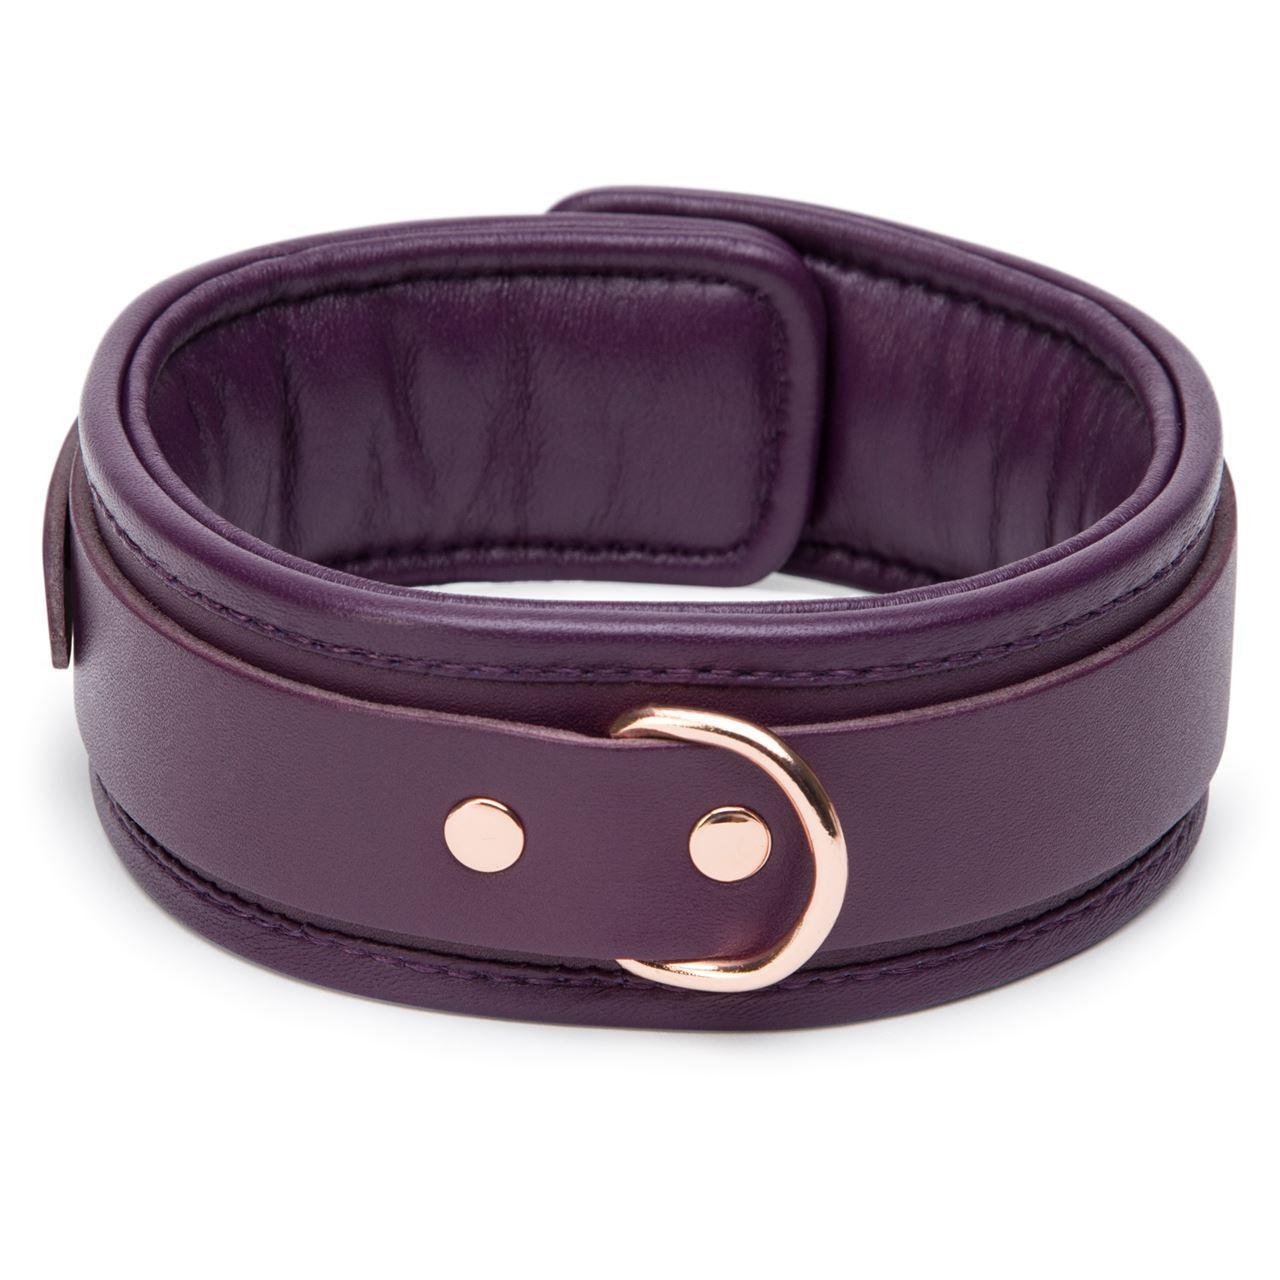 0015262_fifty-shades-freed-cherished-collection-leather-collar-lead_fibufhtidsbej8fl.jpeg